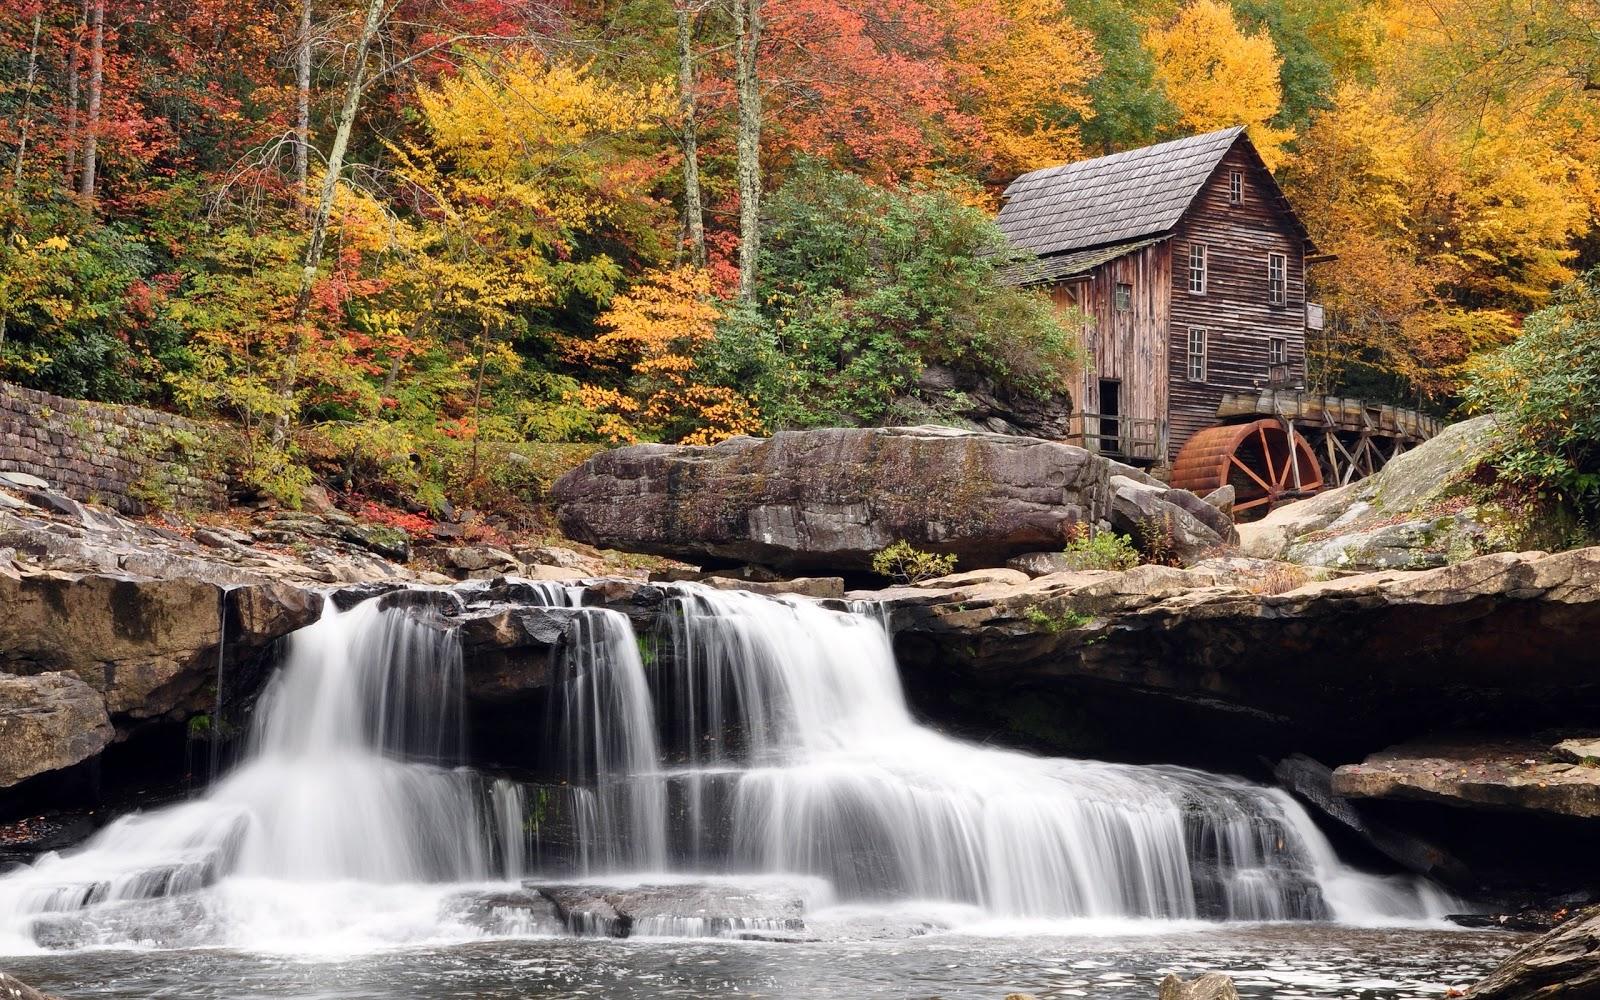 http://1.bp.blogspot.com/-nsO25PPgGGU/T4_NEcjbH8I/AAAAAAAADWE/G8YYRsqJNRE/s1600/autumn-watermill-falls-windows-8-wallpaper-2560x1600.jpg